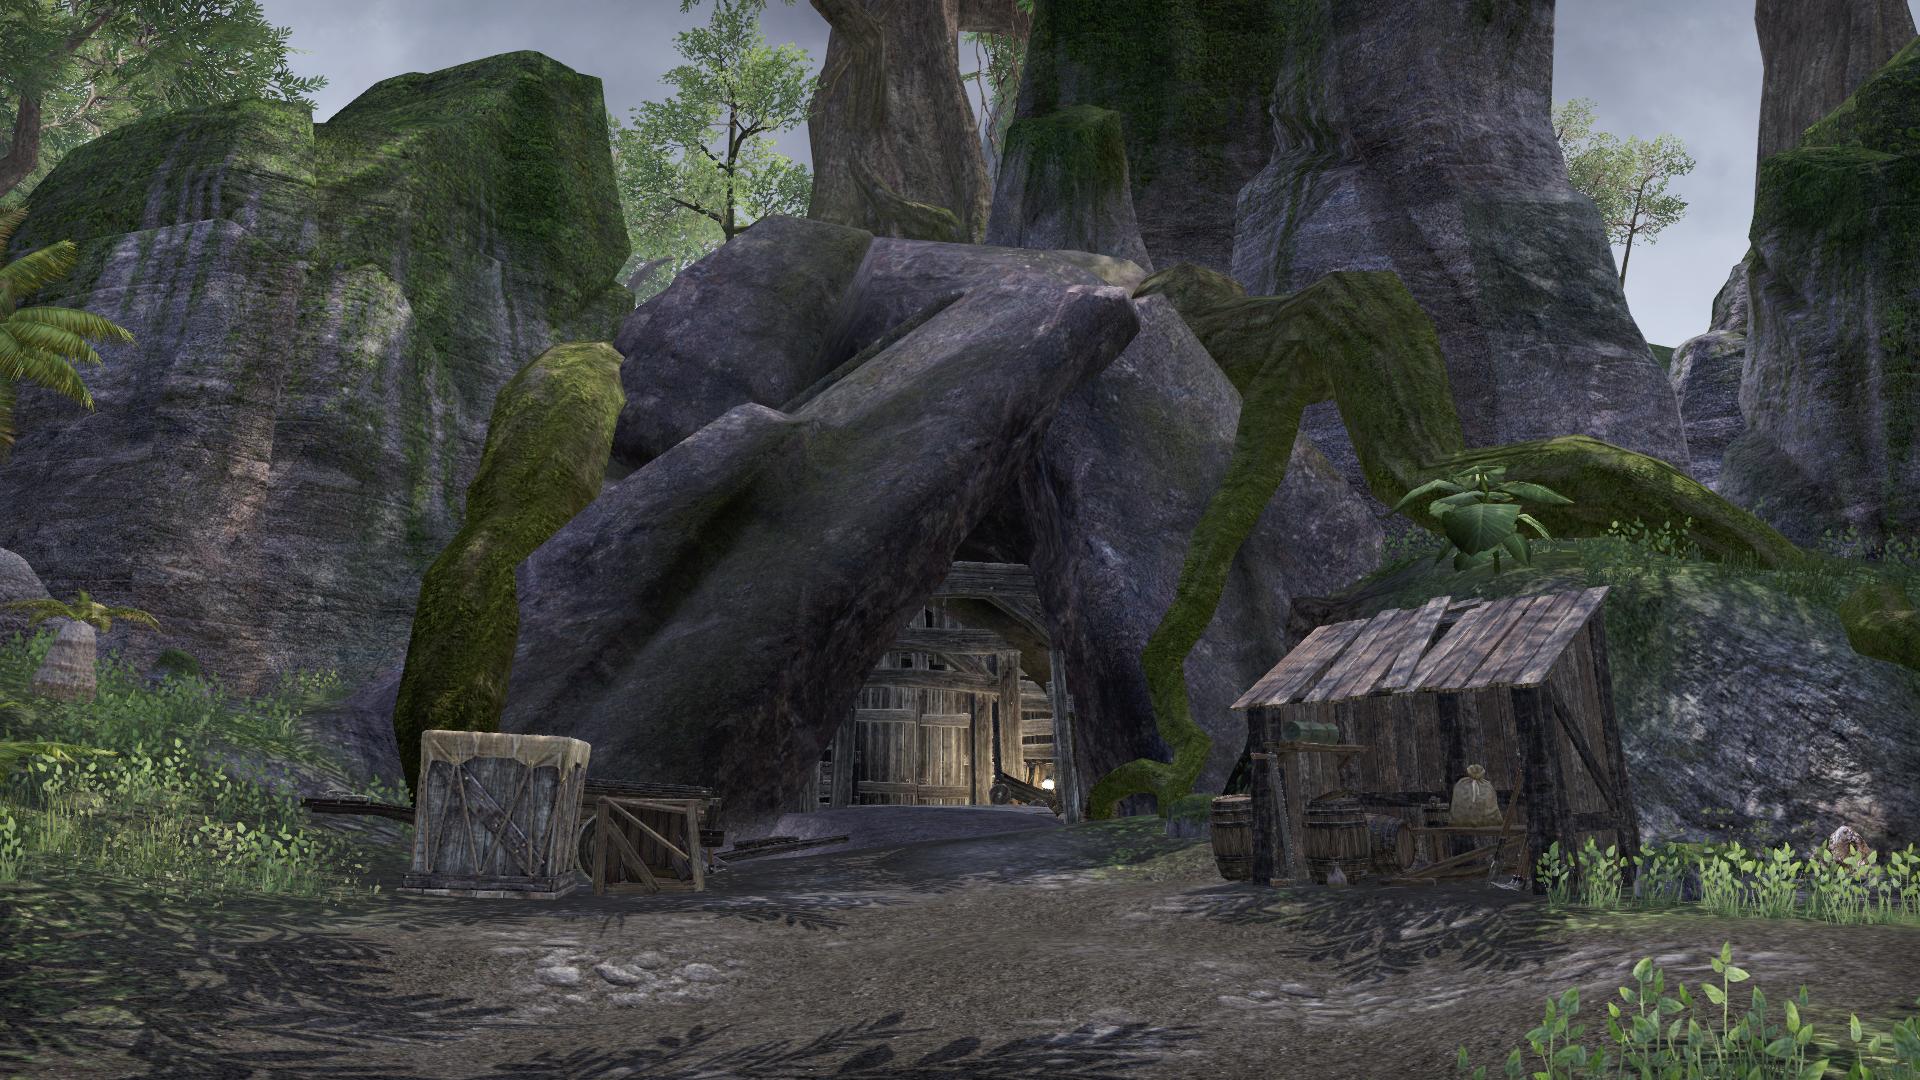 Mobar Mine